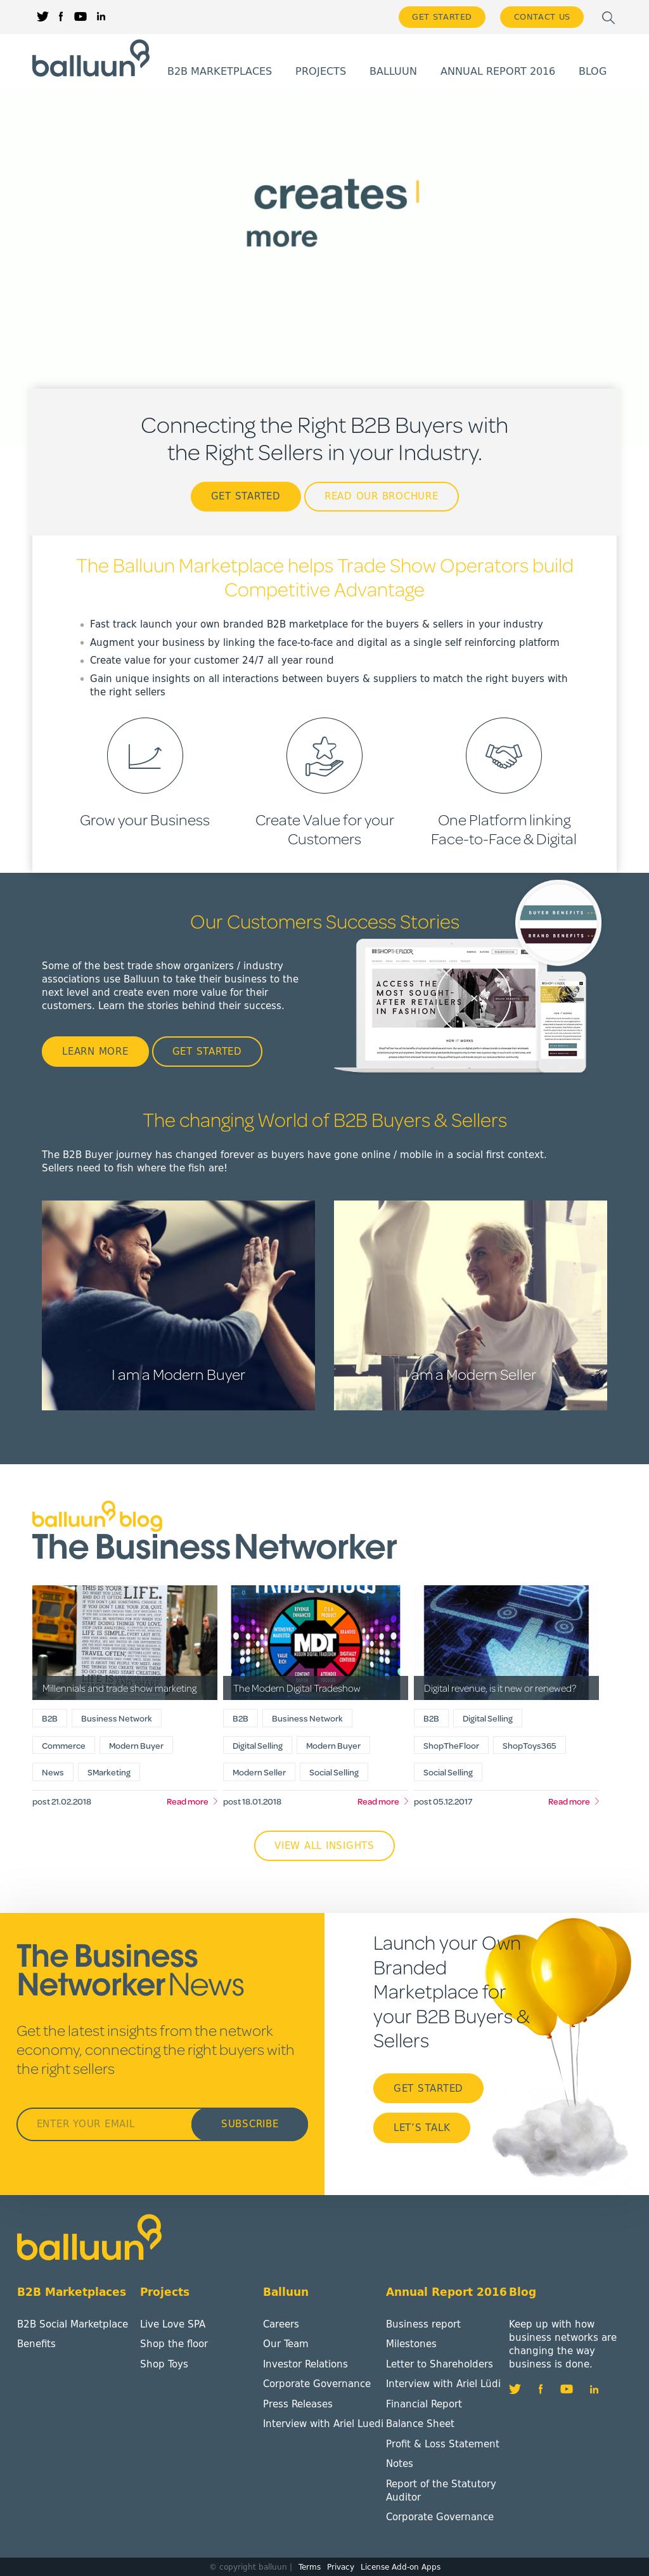 Balluun Competitors, Revenue and Employees - Owler Company